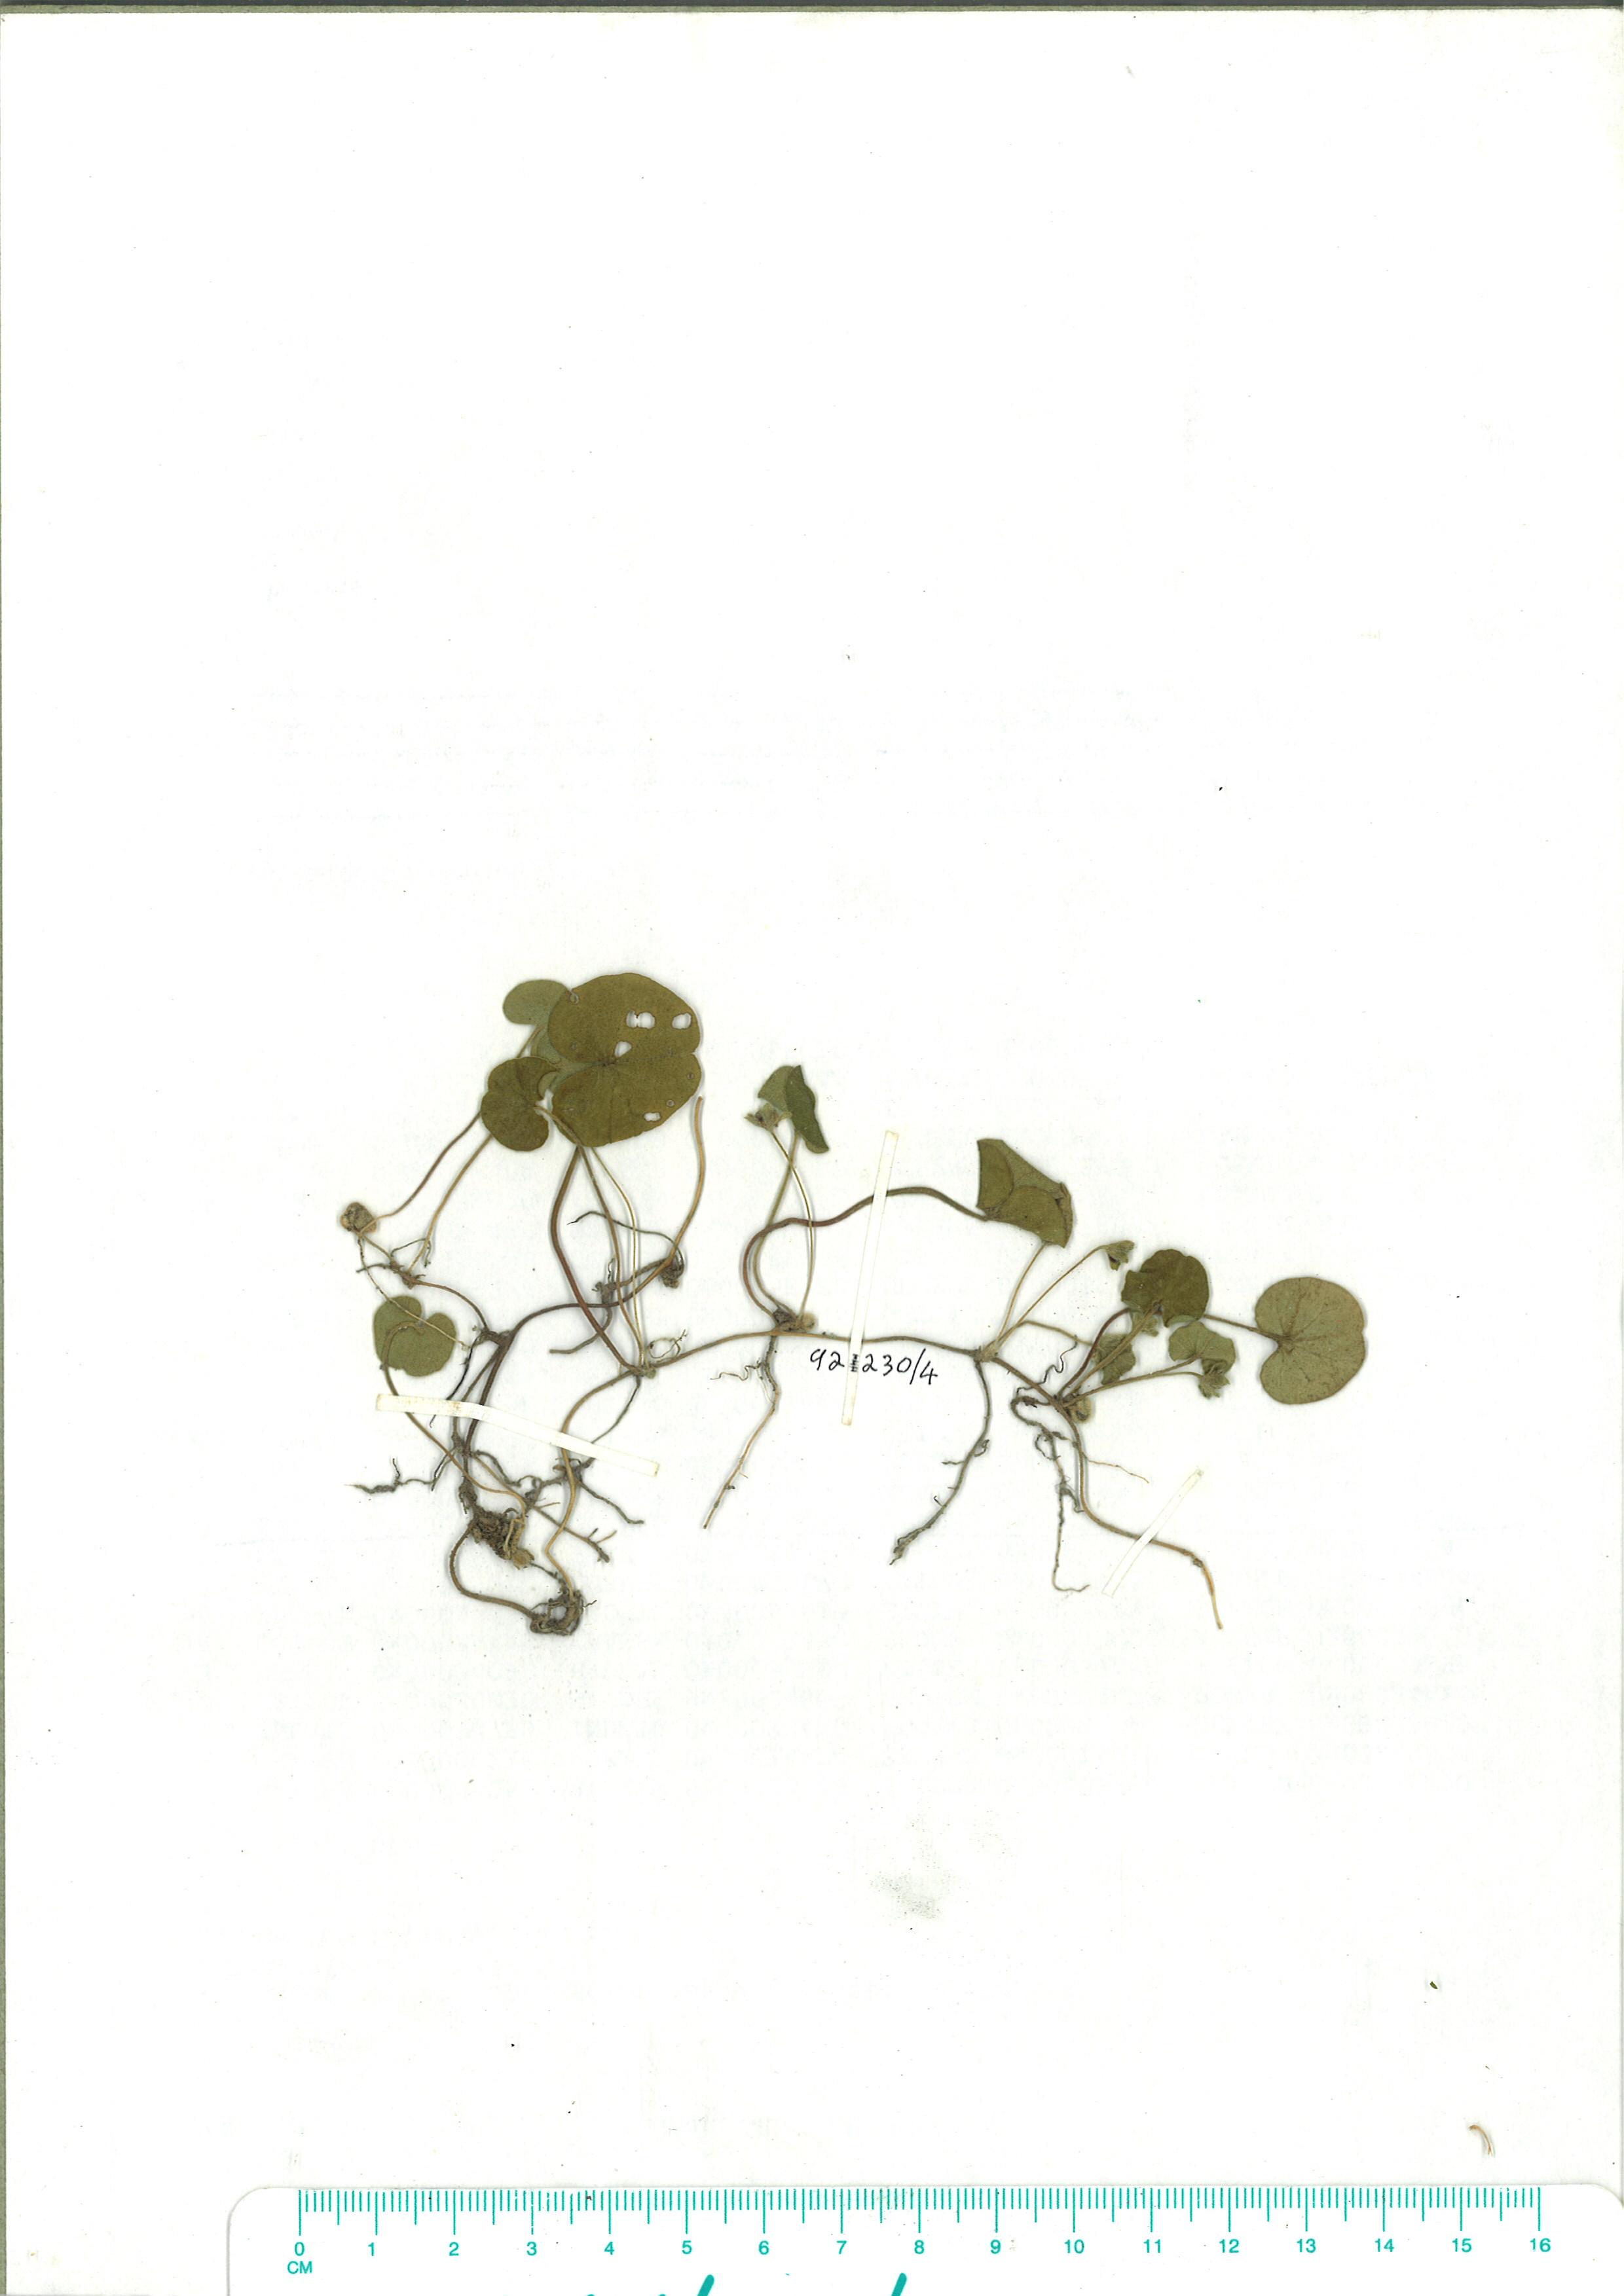 Scanned herbarium image od Dichondra repens